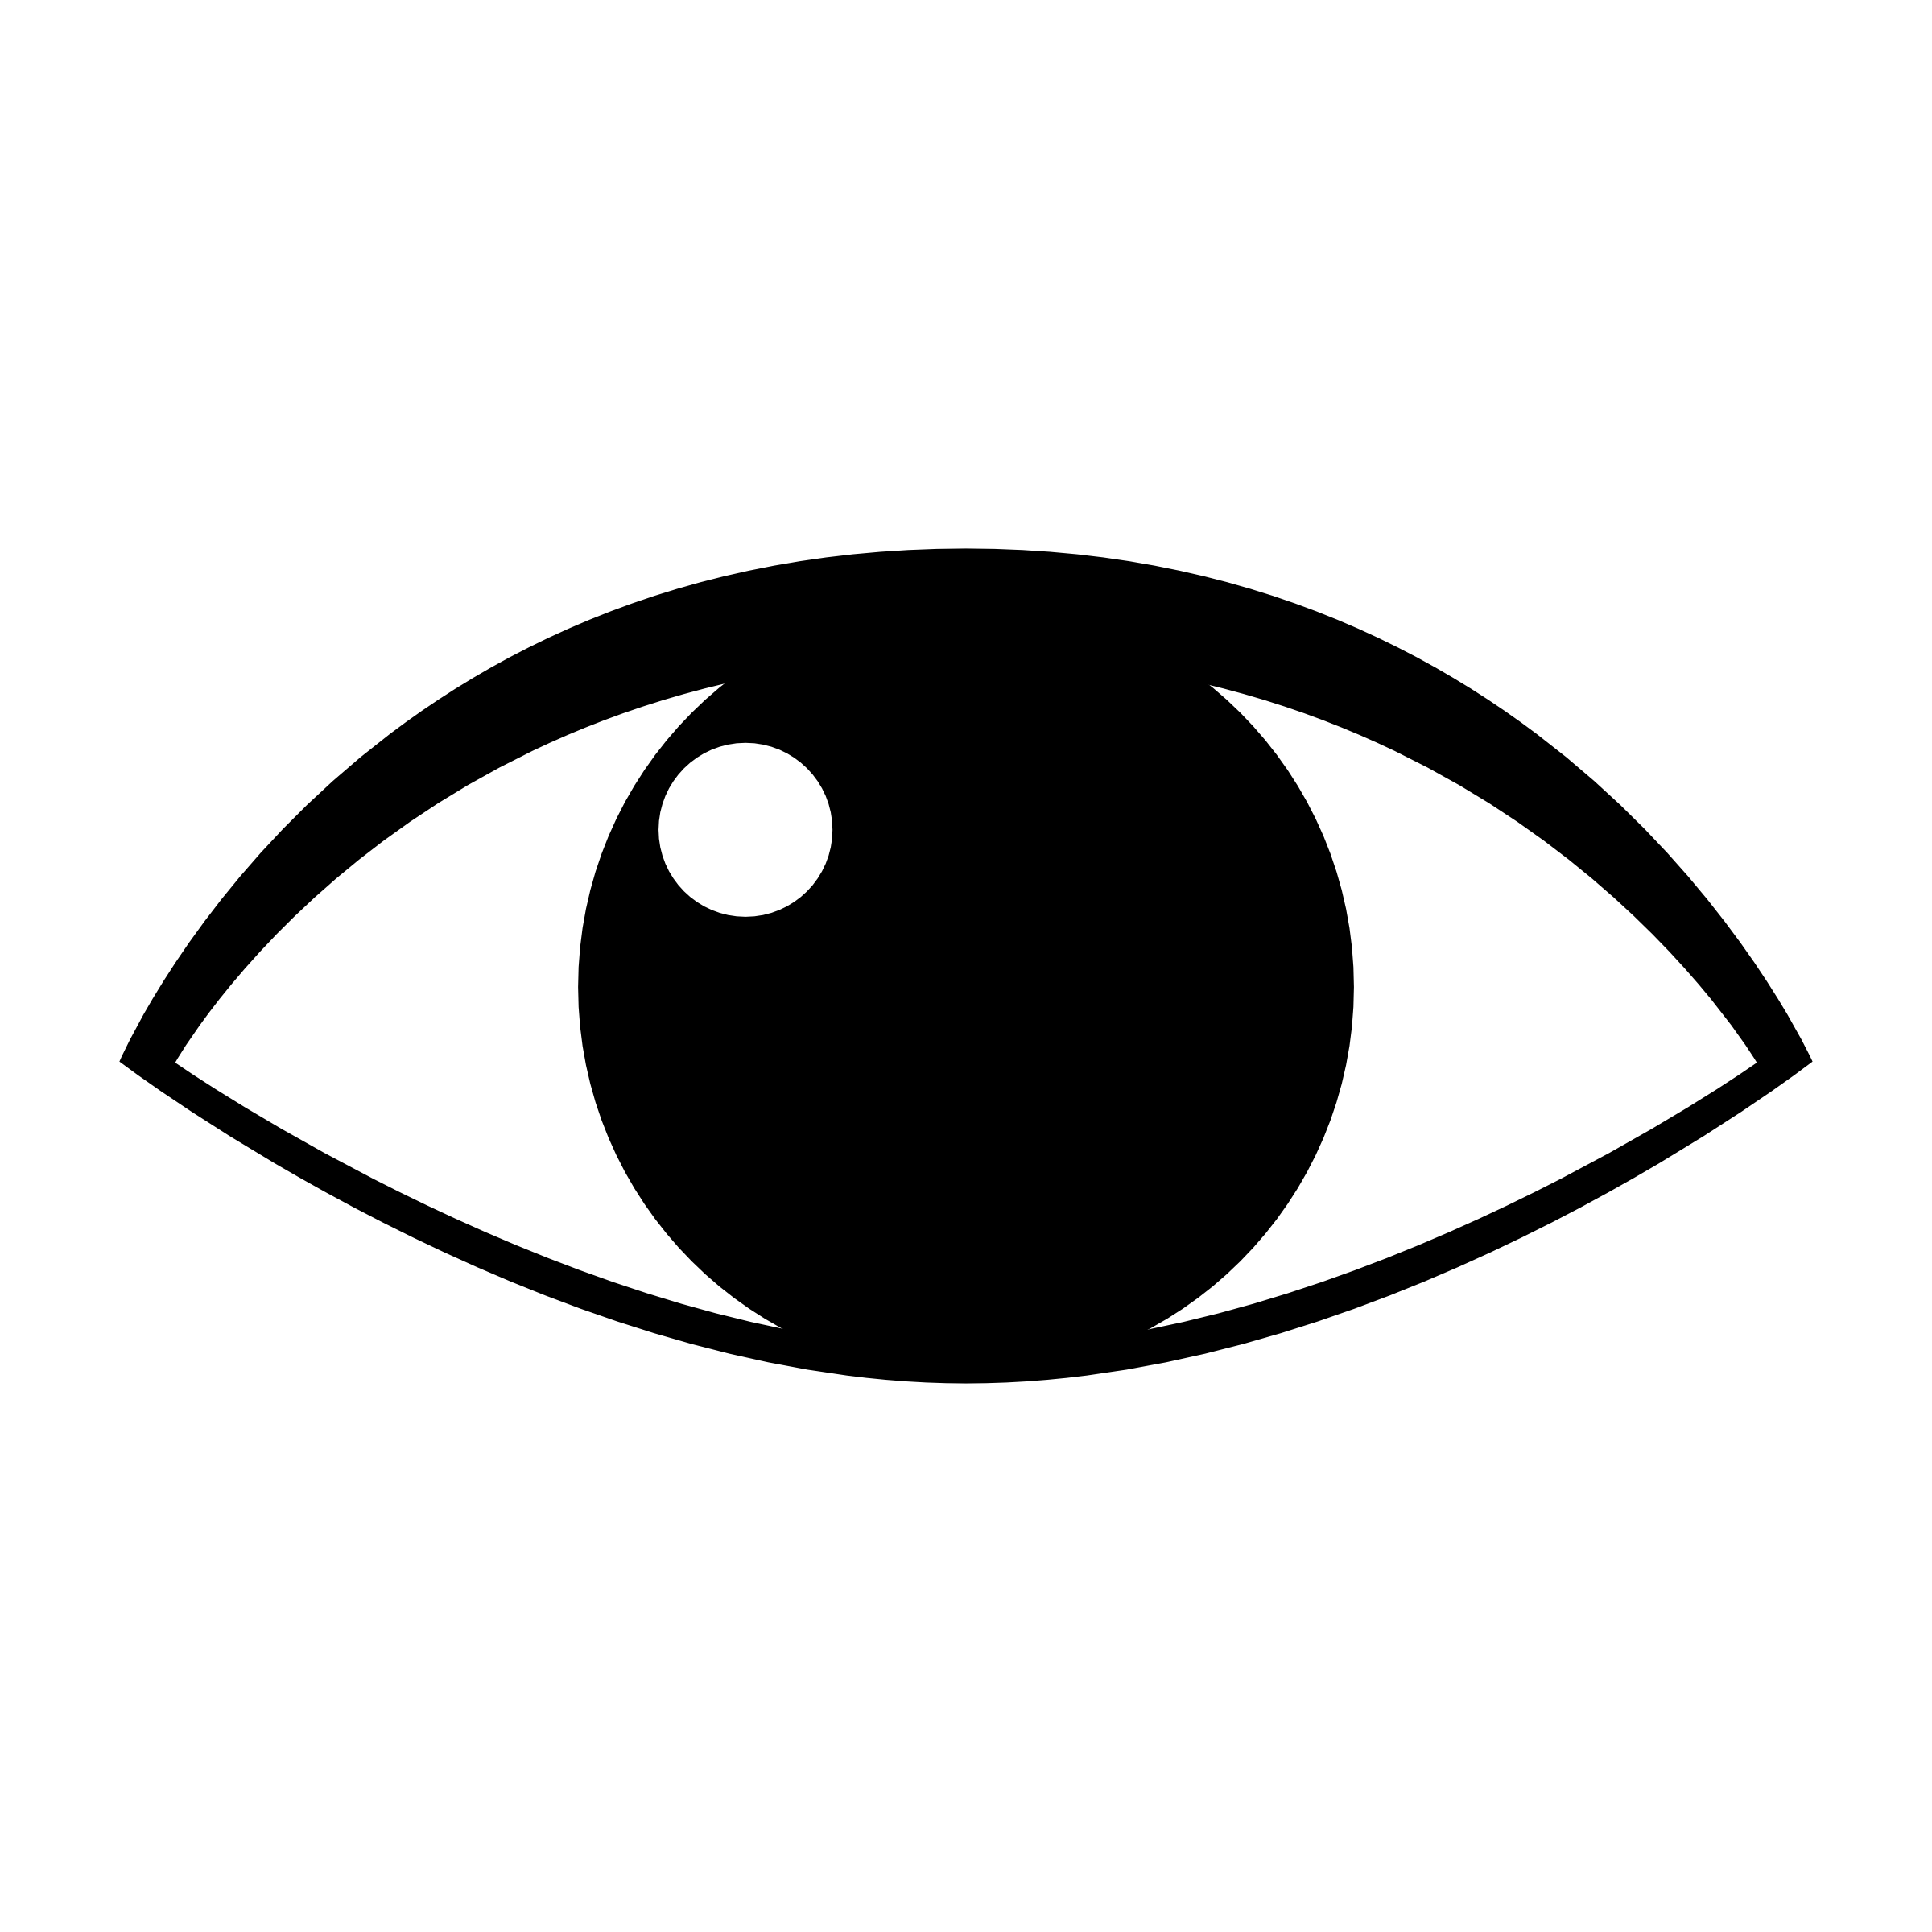 Eyeball clipart black and white 3 » Clipart Station.